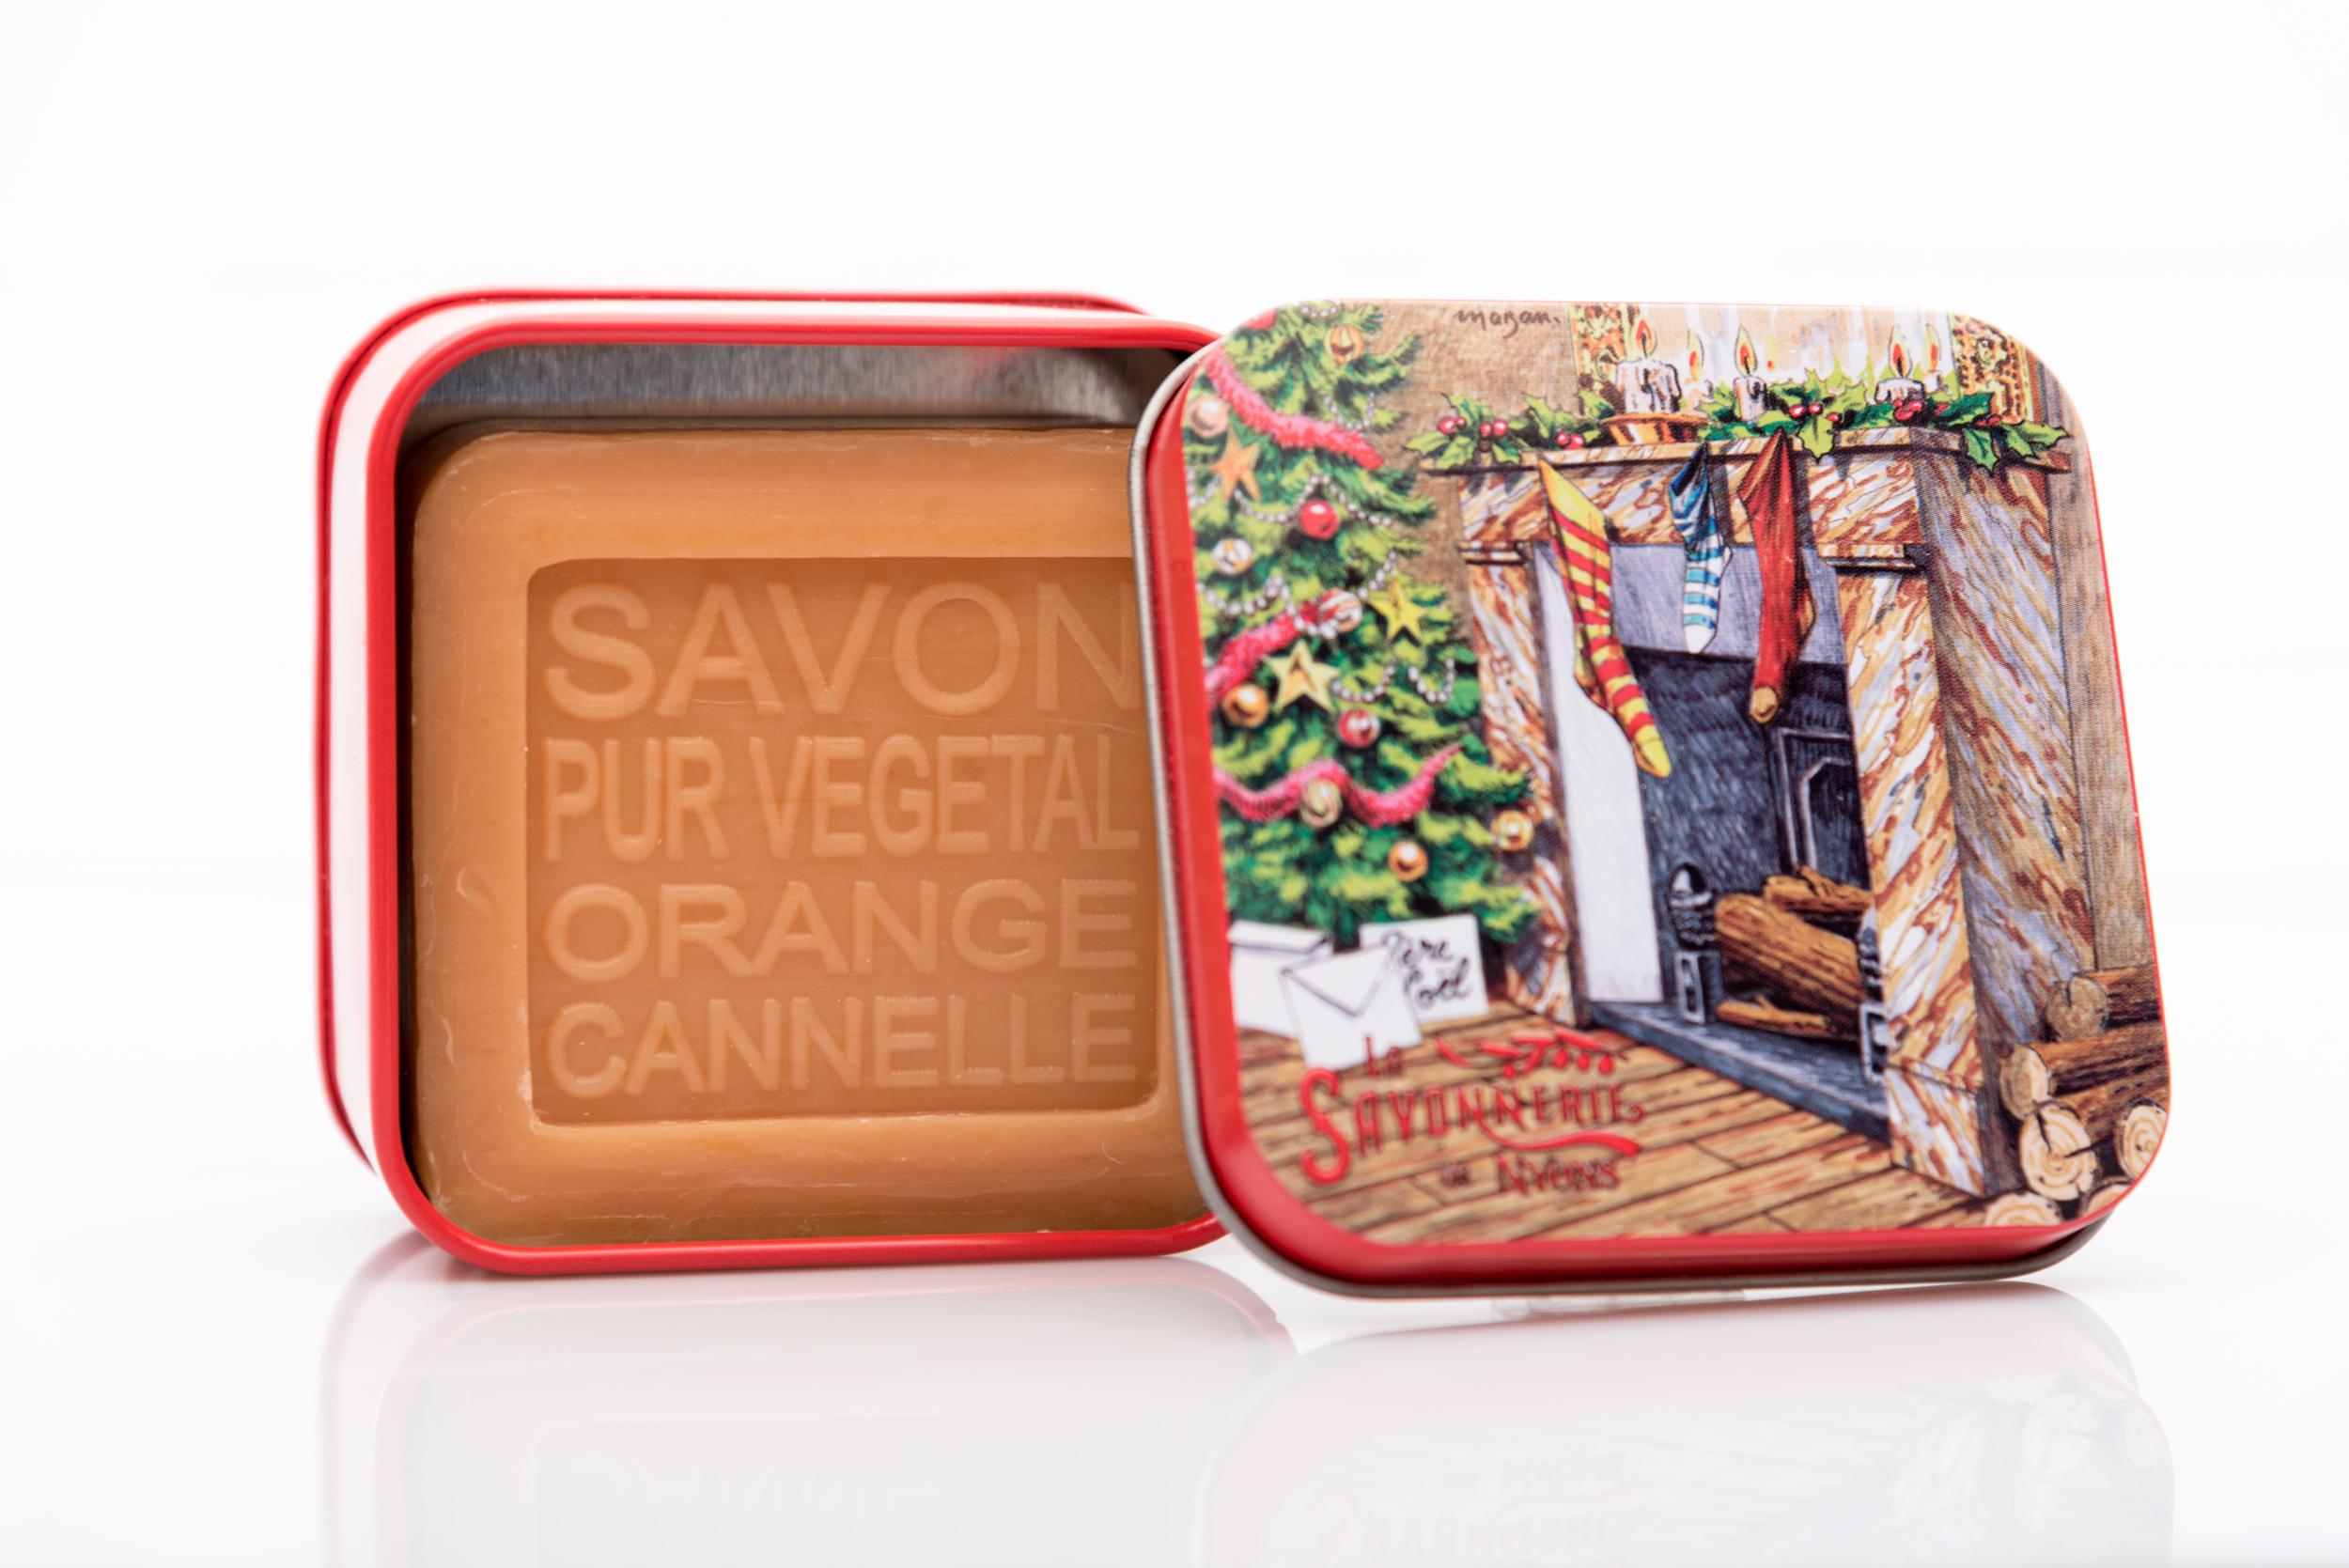 SAVON DE NYONS VEGETAL MADE IN FRANCE AVEC BOITE METALIQUE MODELE 55 ORANGE CANNELLE